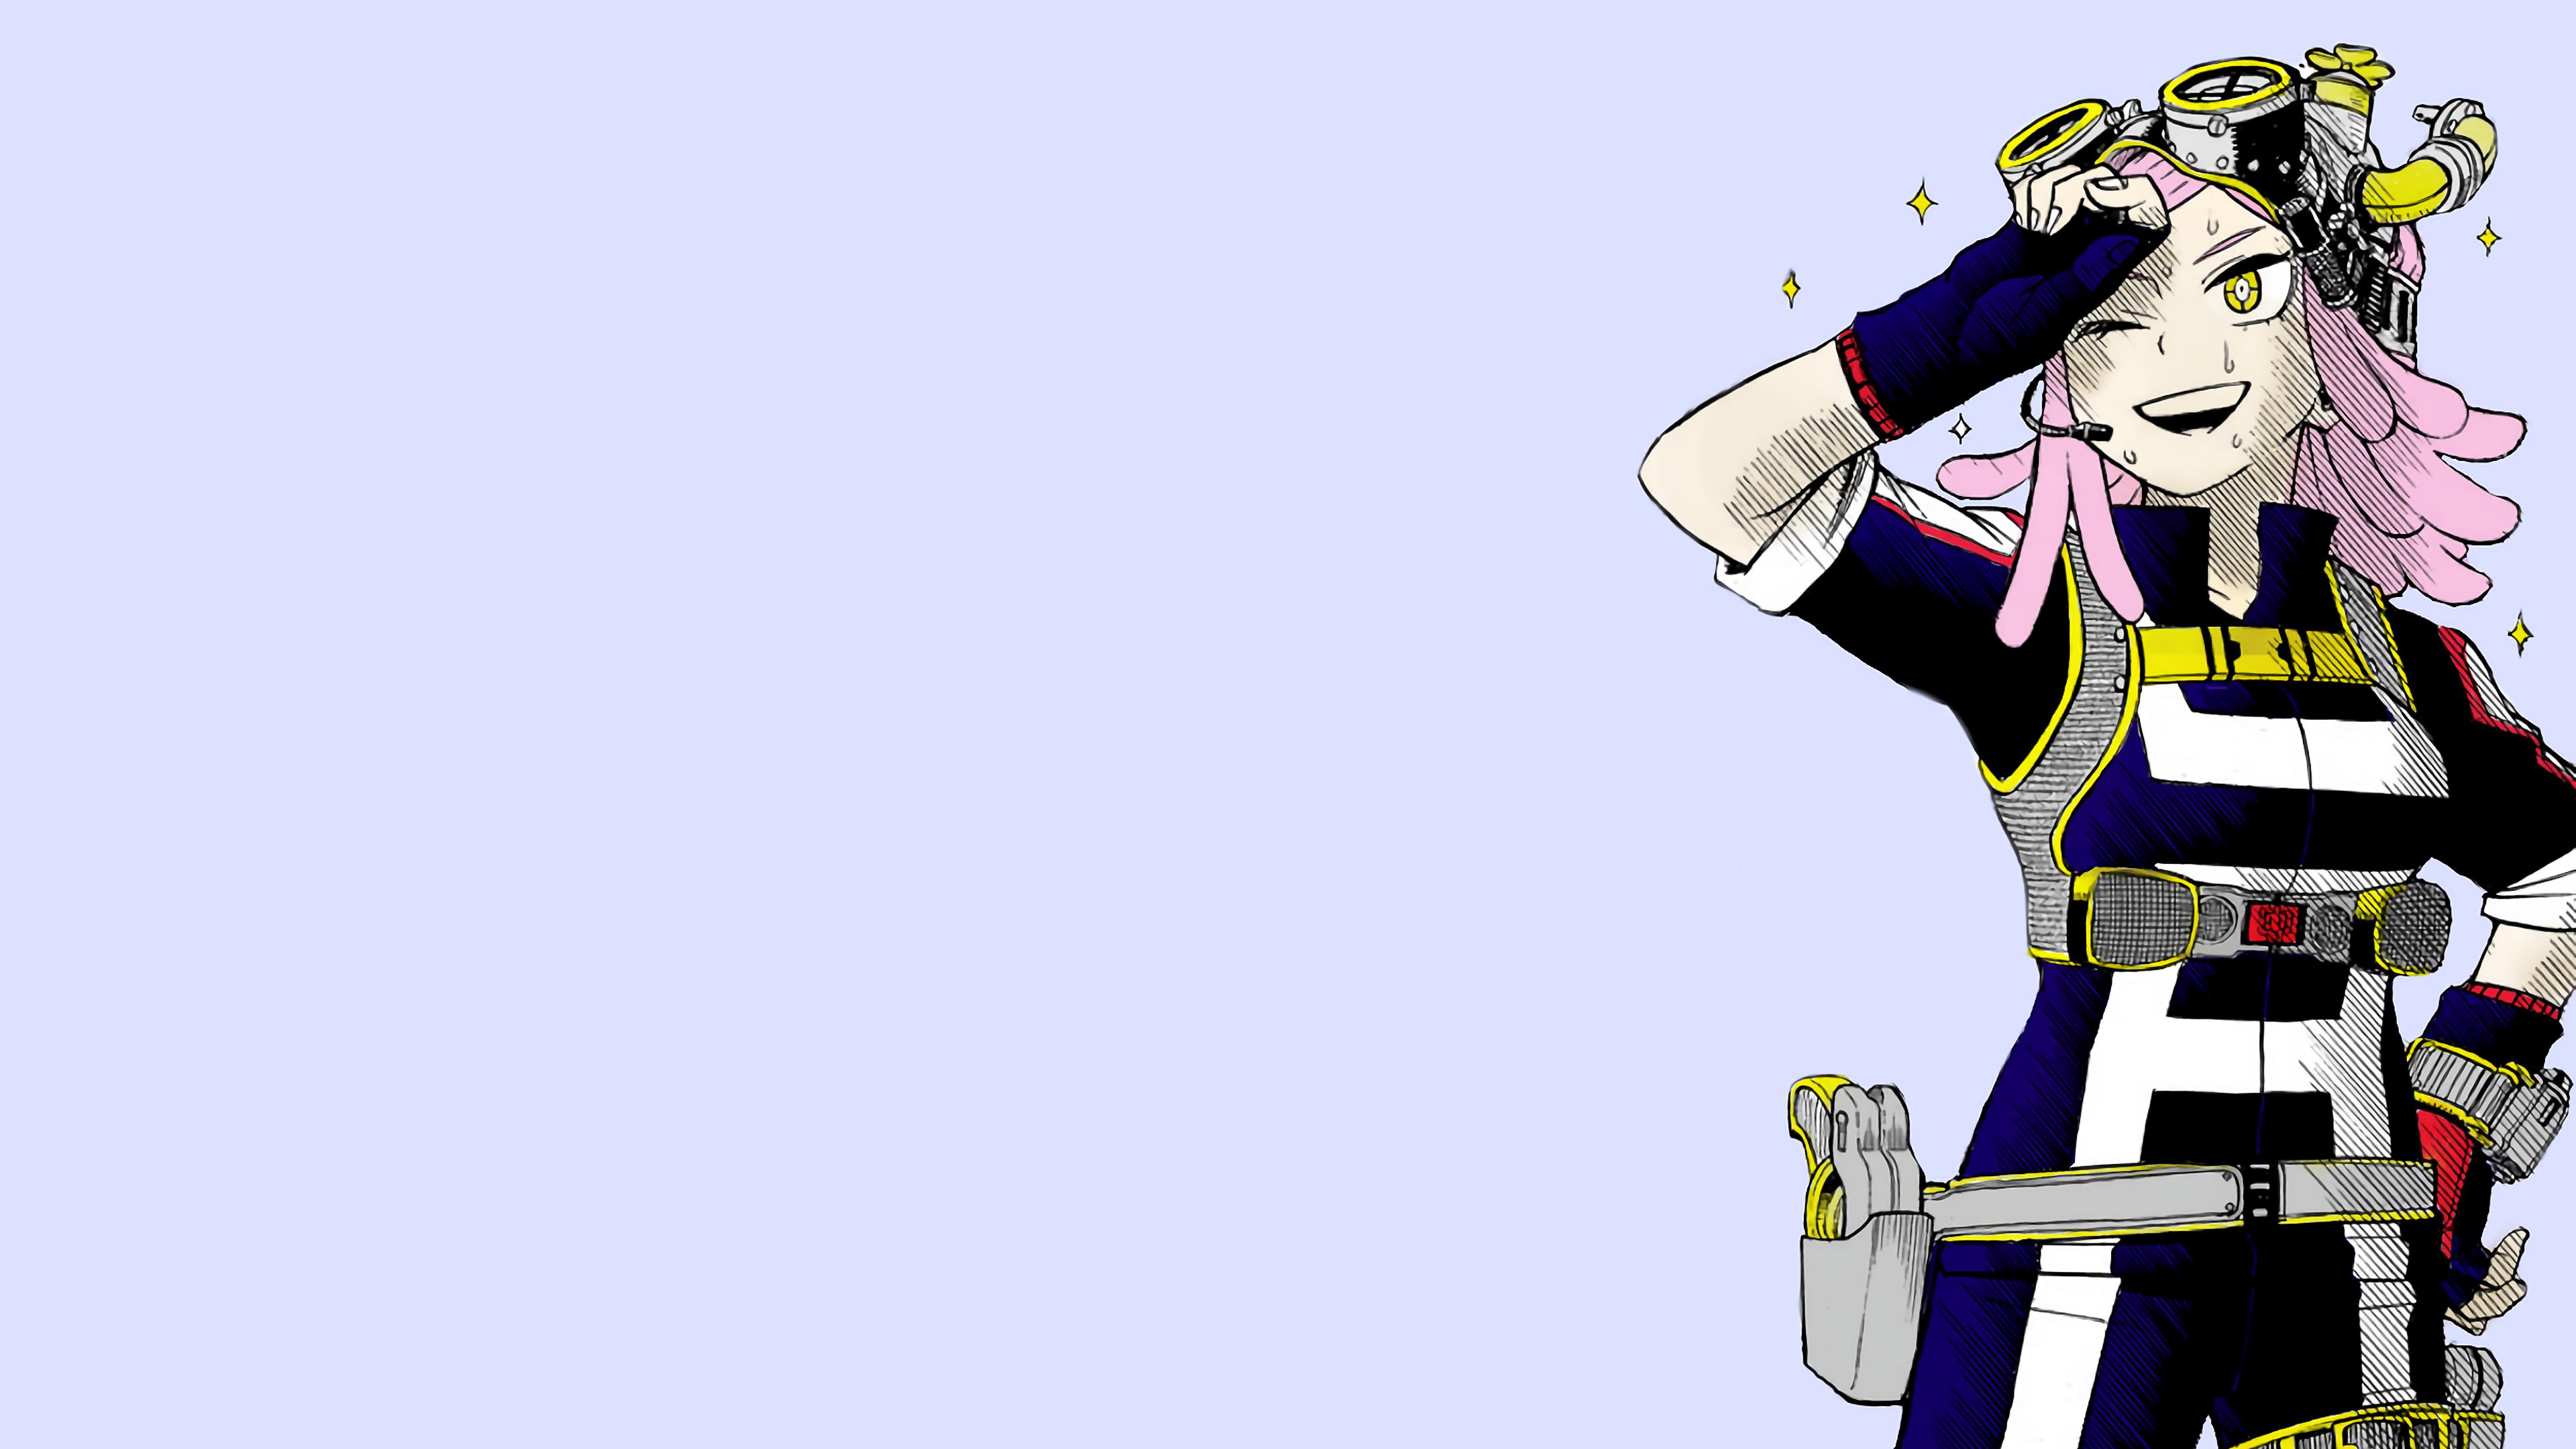 My Hero Academia 4k Ultra HD Wallpaper | Background Image ...